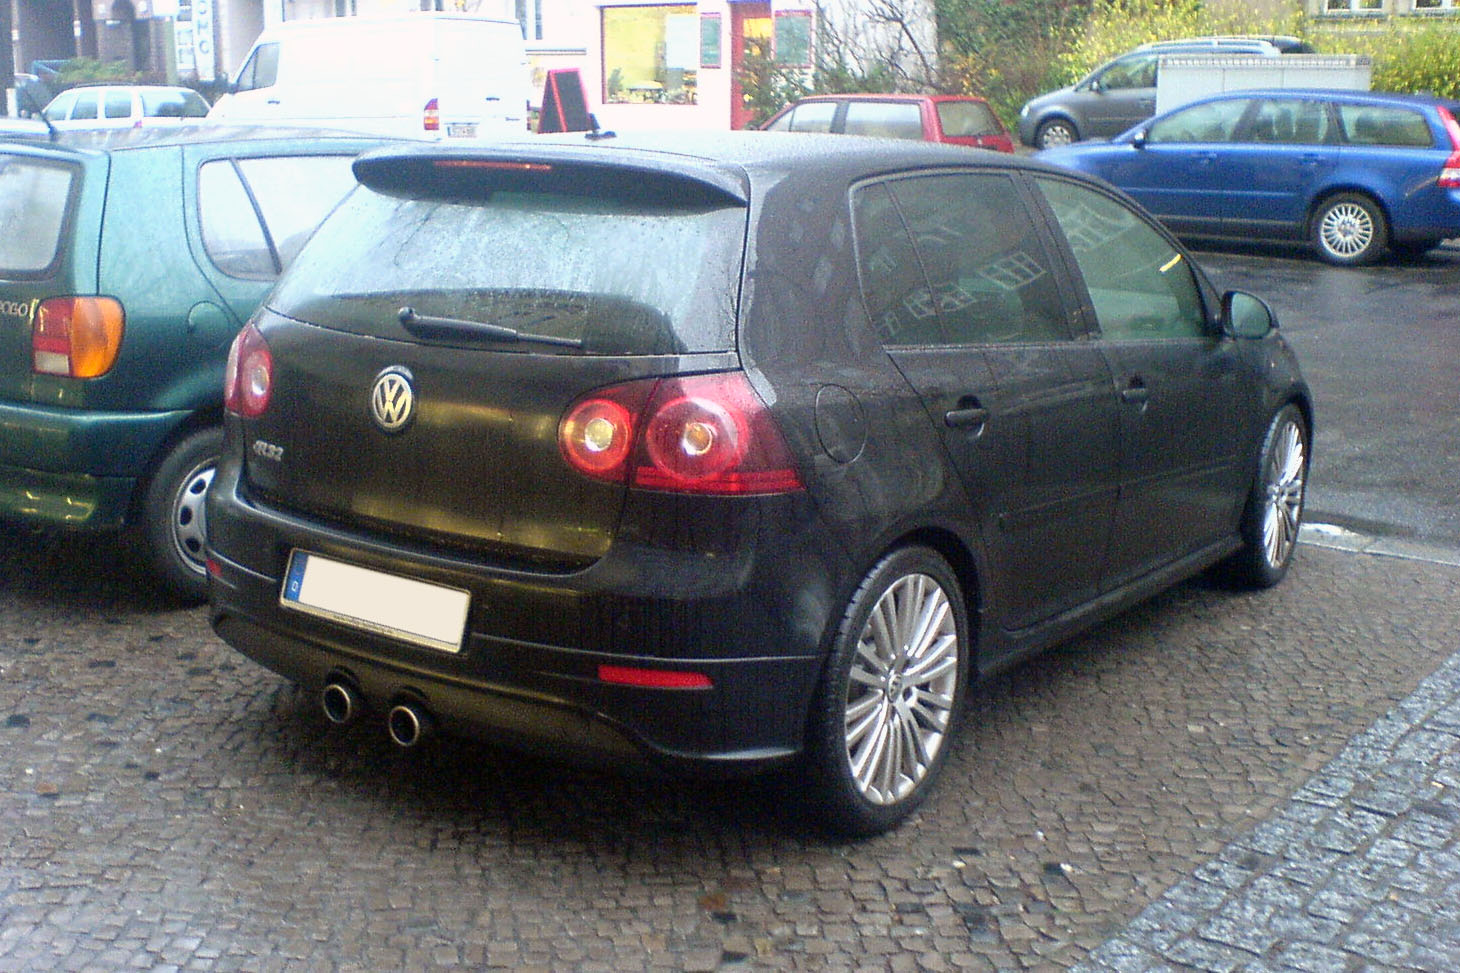 Volkswagen Golf 5 R32